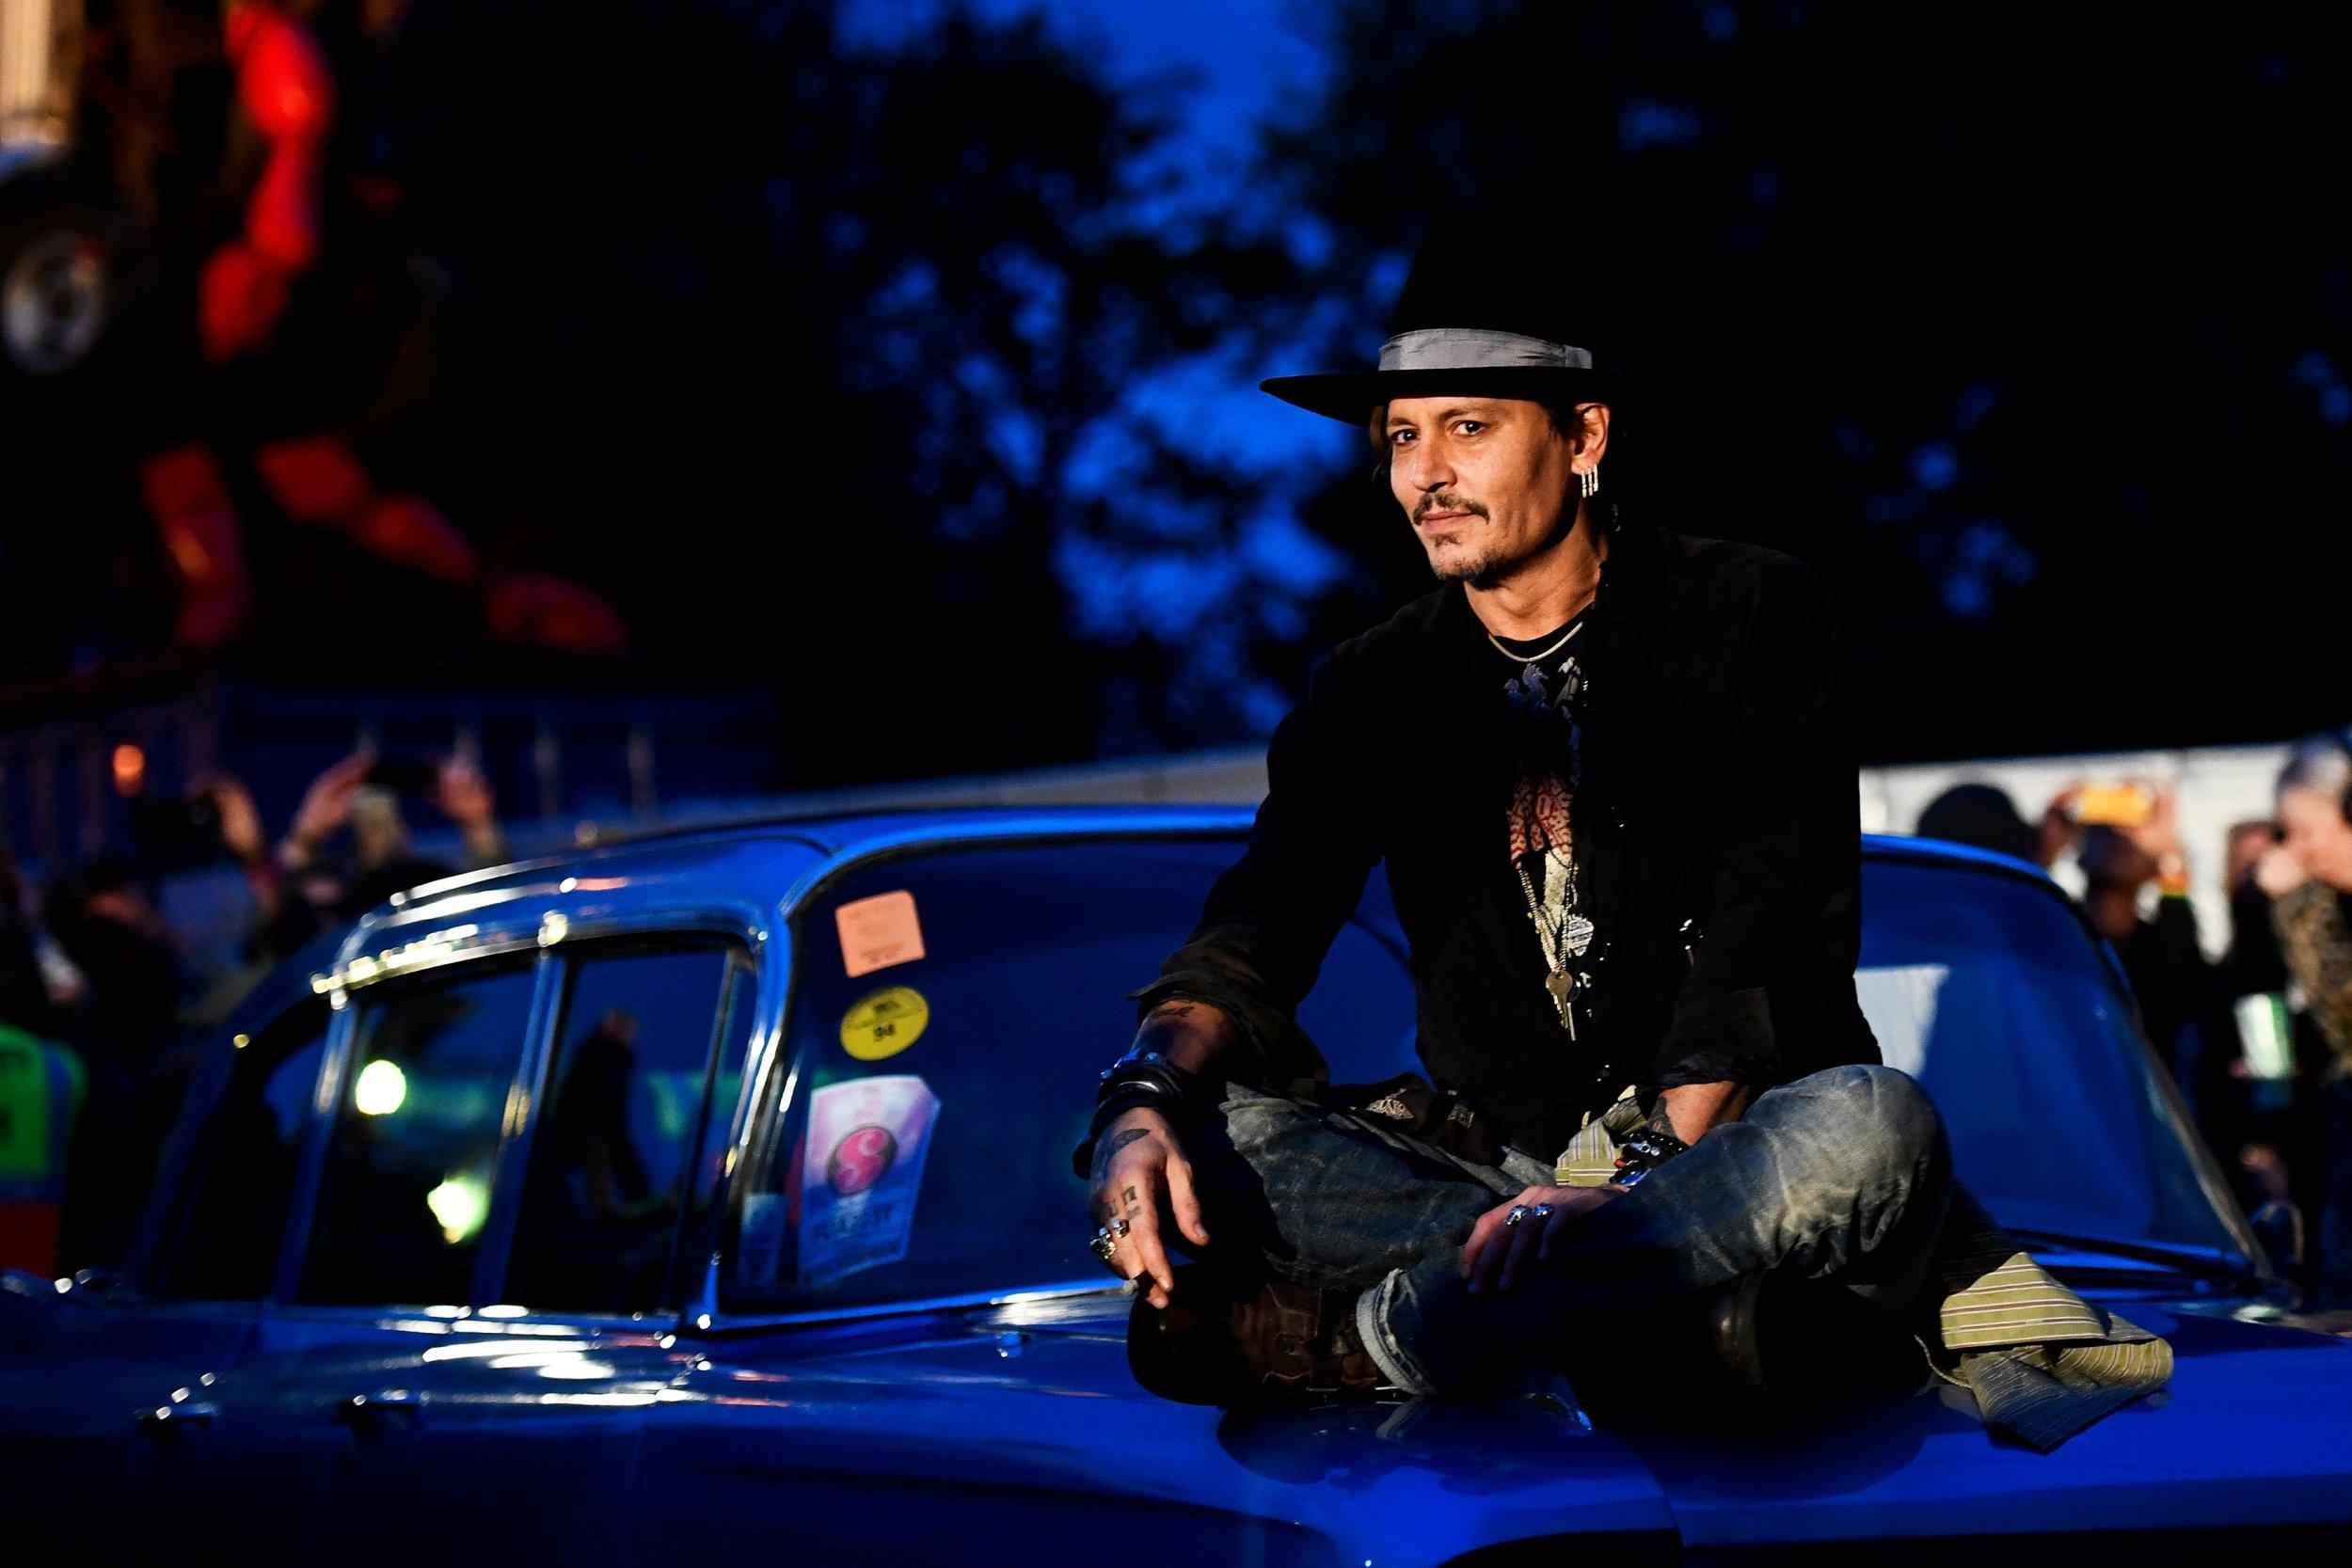 Johnny Depp pops up at Glastonbury, talks about assassinating Donald Trump